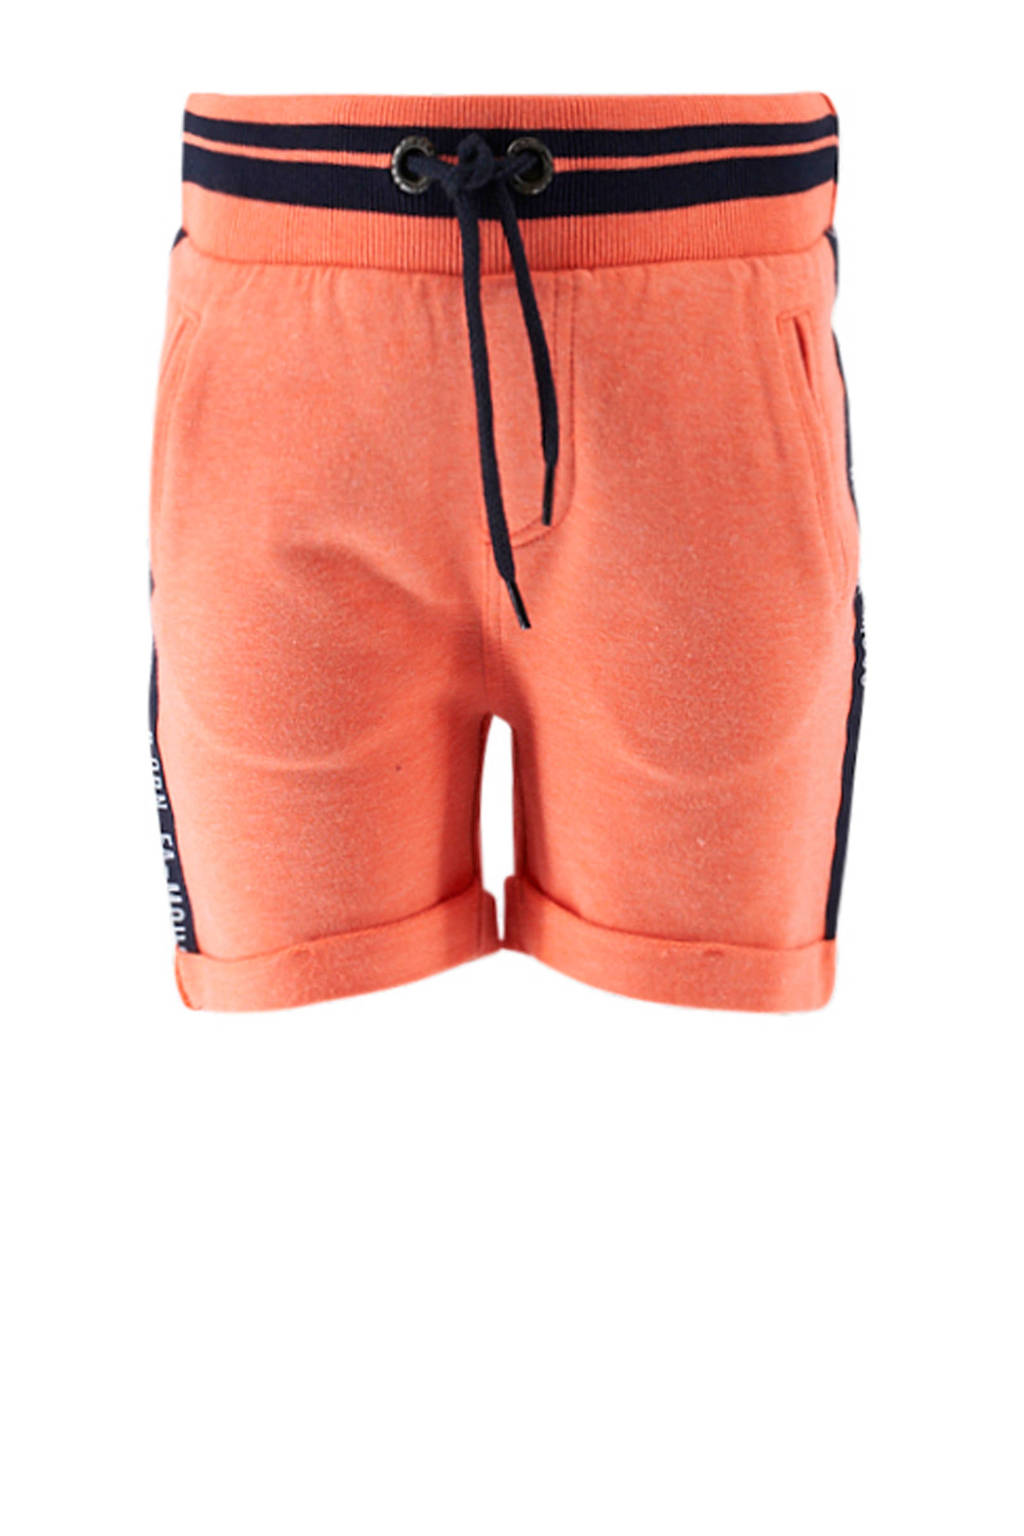 born to be famous. baby sweatshort oranje/zwart, Oranje/zwart